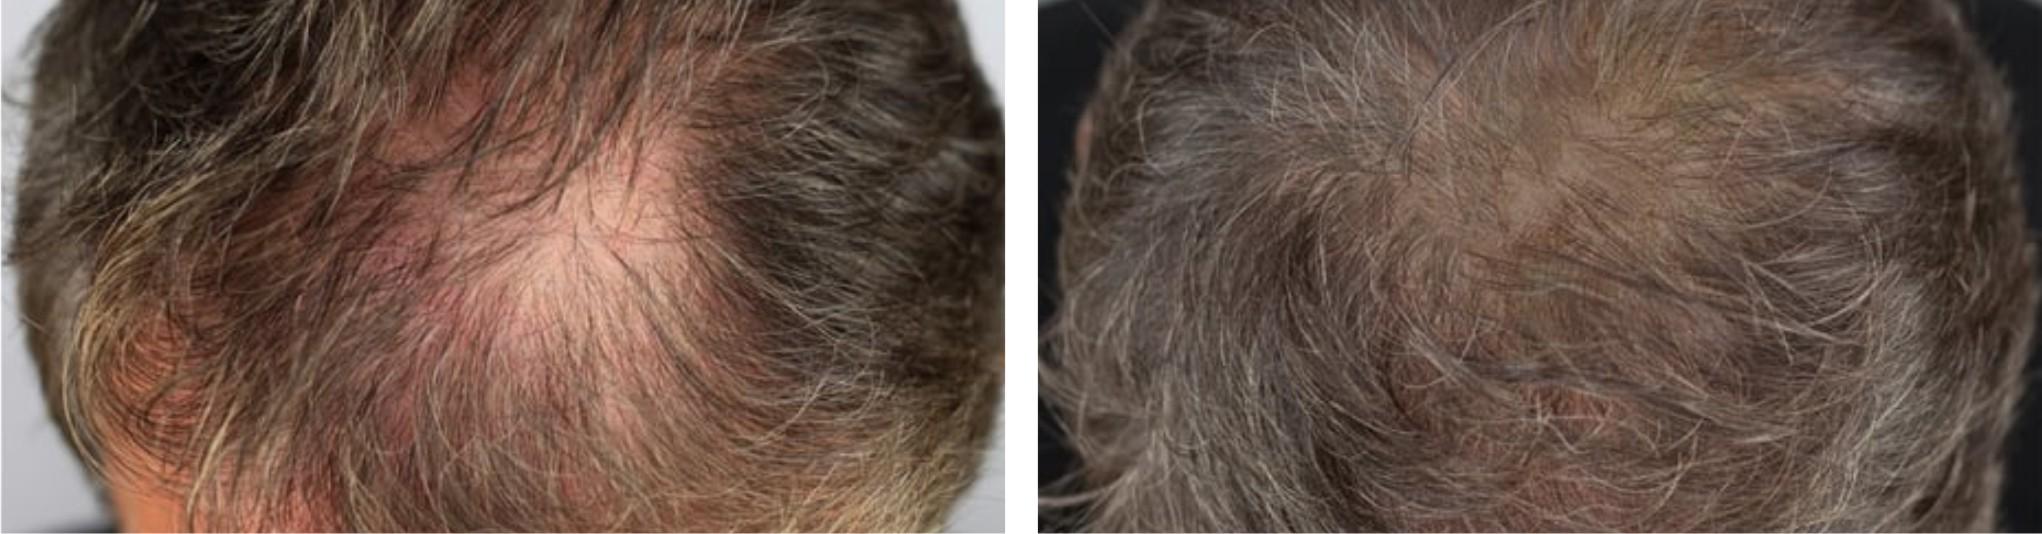 Hair Follicle Simulation Image Two